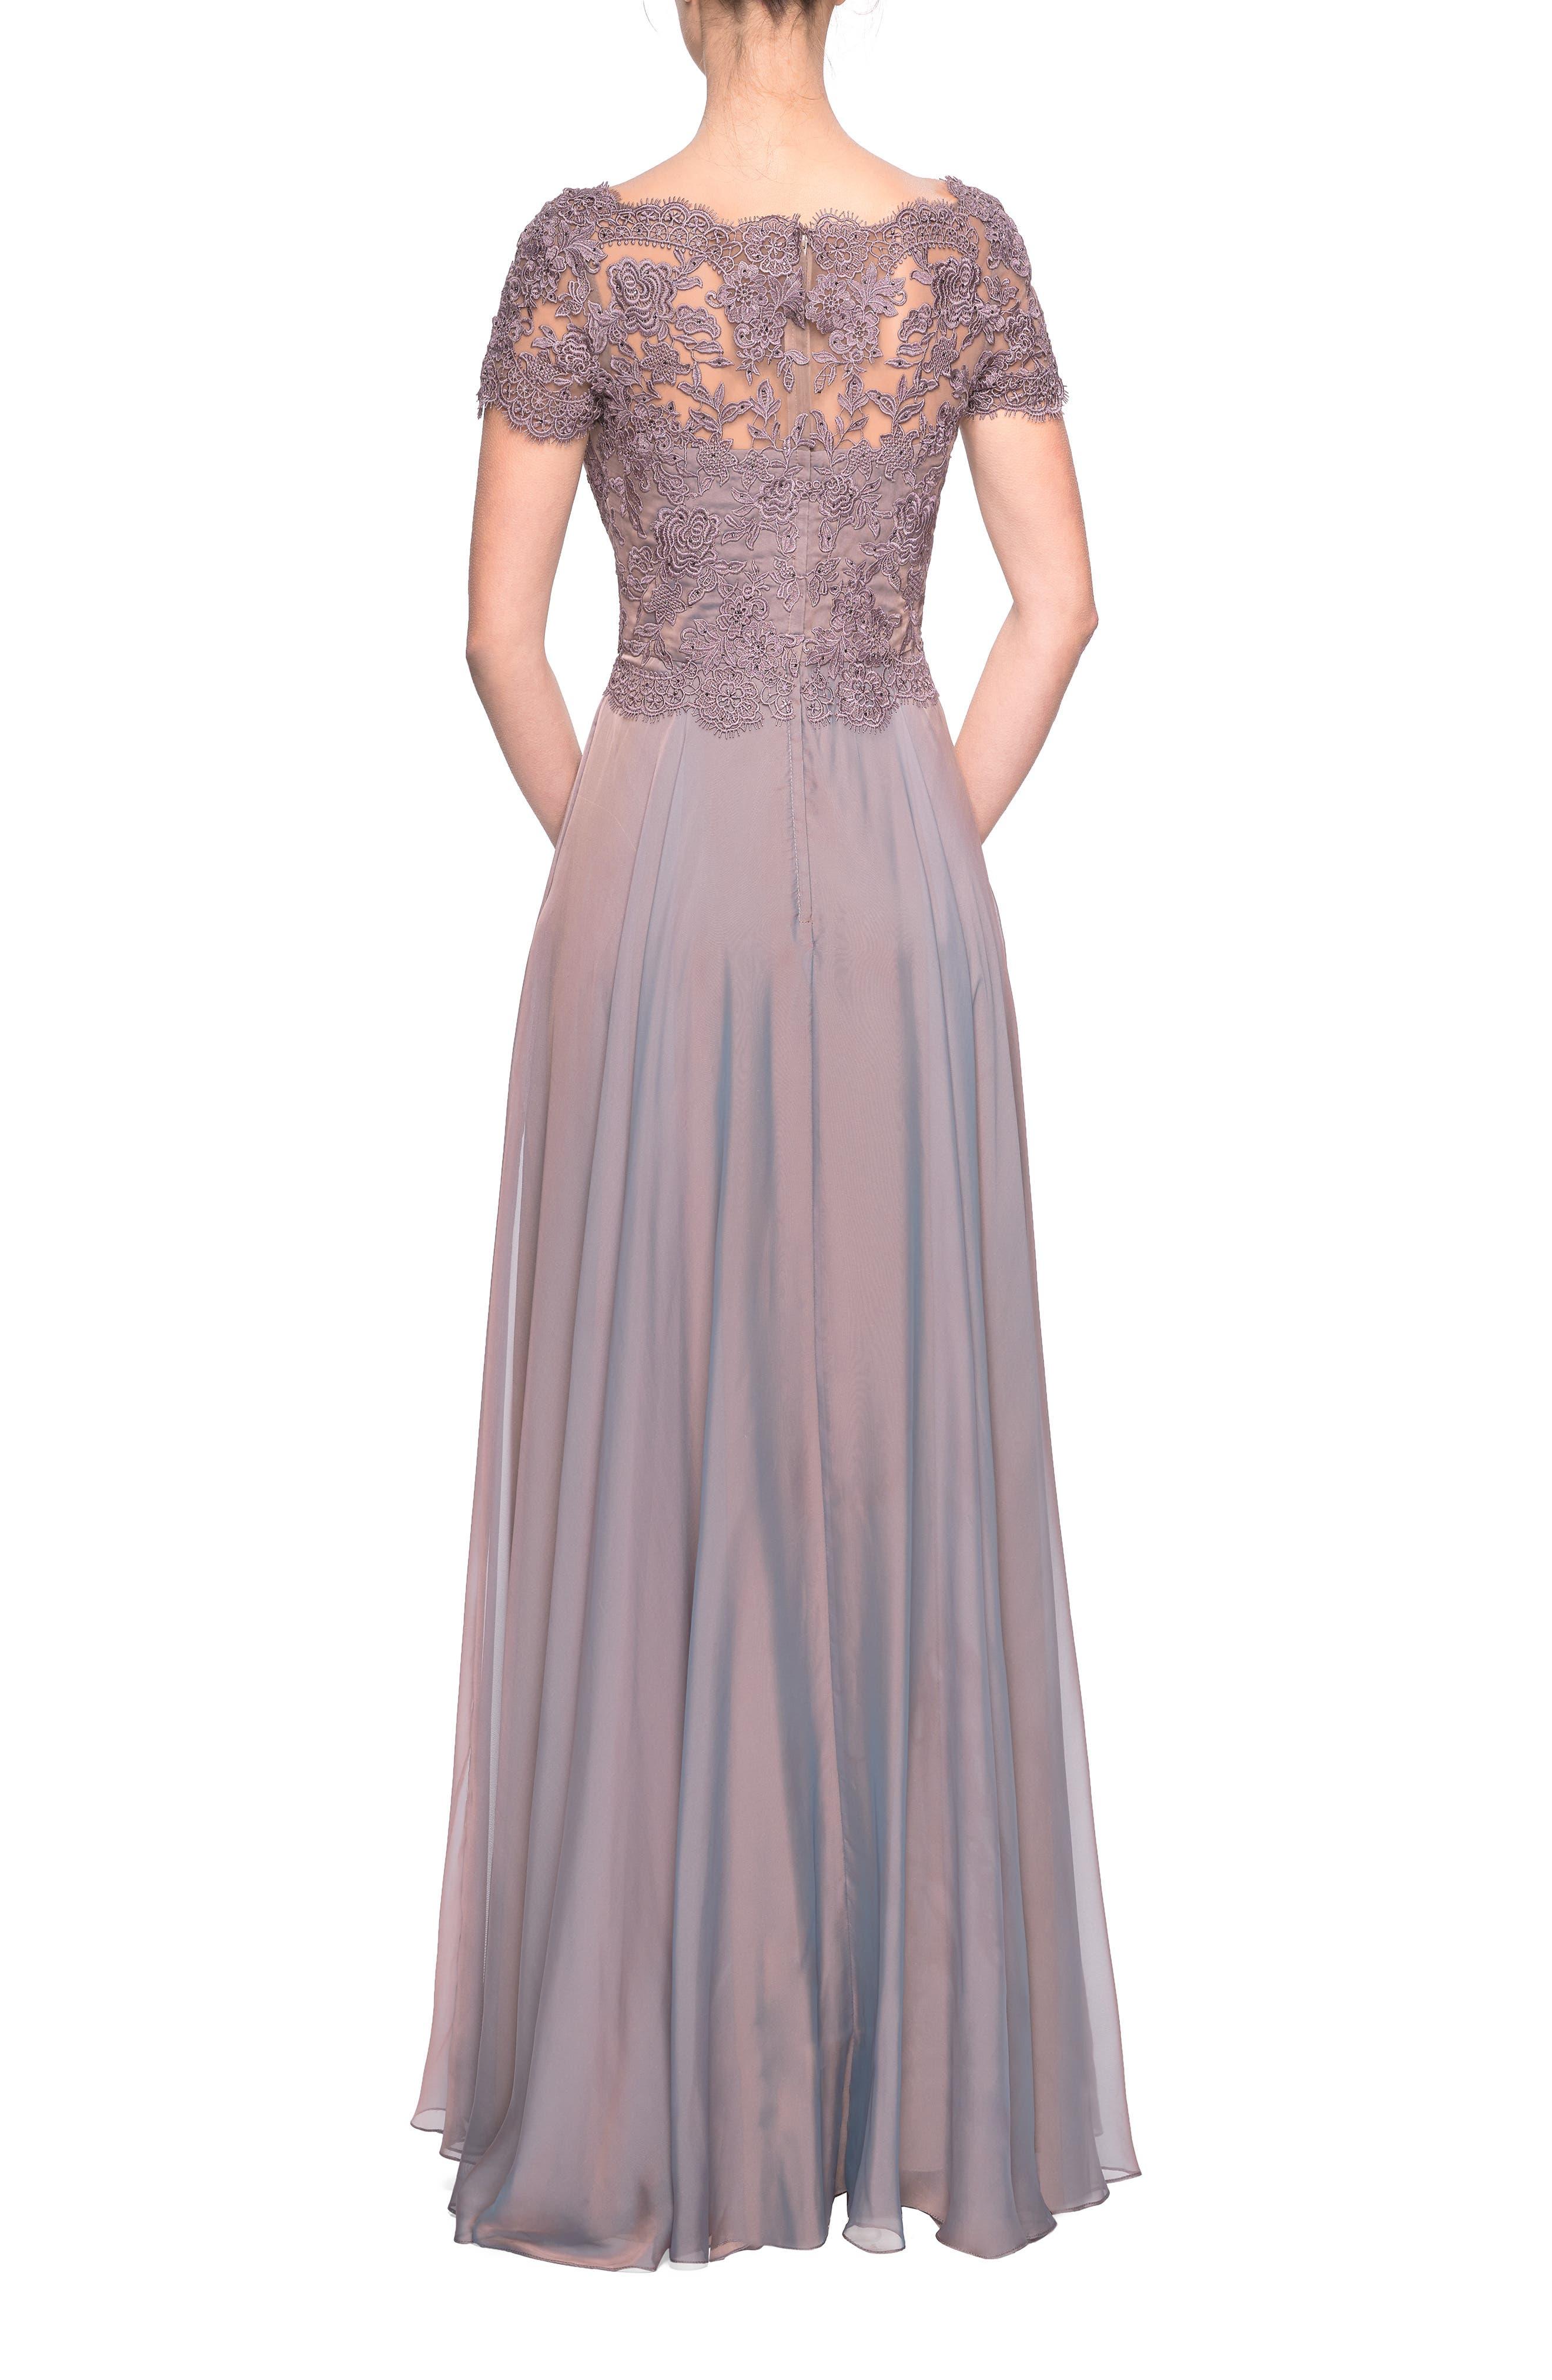 LA FEMME,                             Embroidered Lace & Chiffon Evening Dress,                             Alternate thumbnail 2, color,                             COCOA